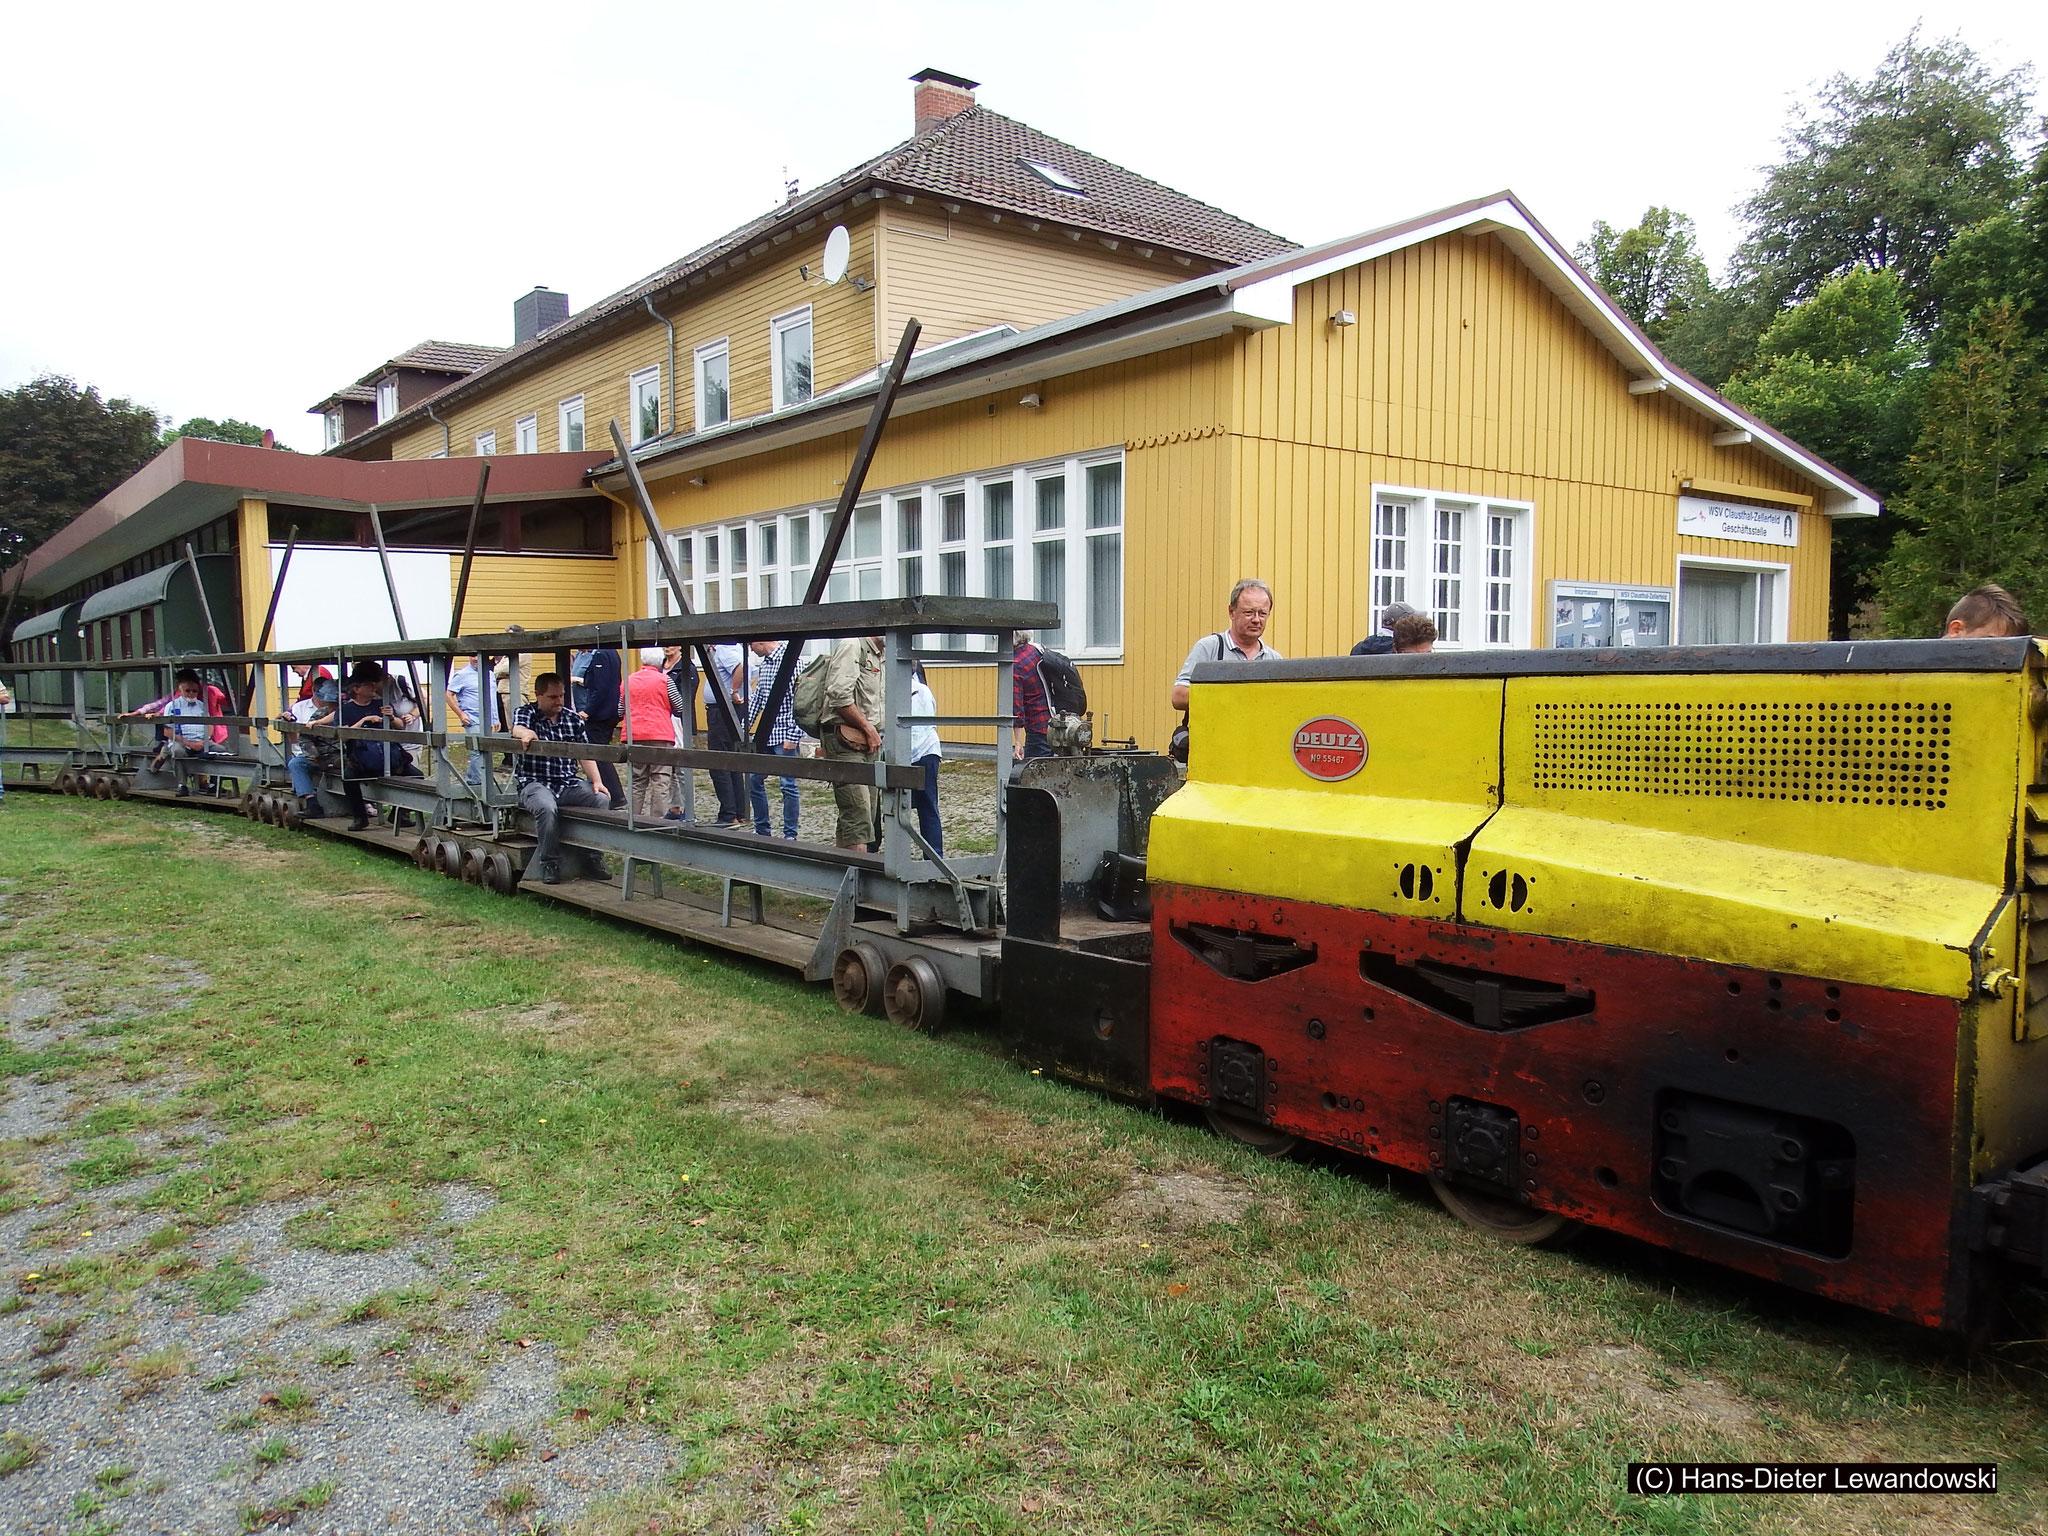 Tagesförderbahn am ehemaligen Bahnhof Clausthal-Zellerfeld